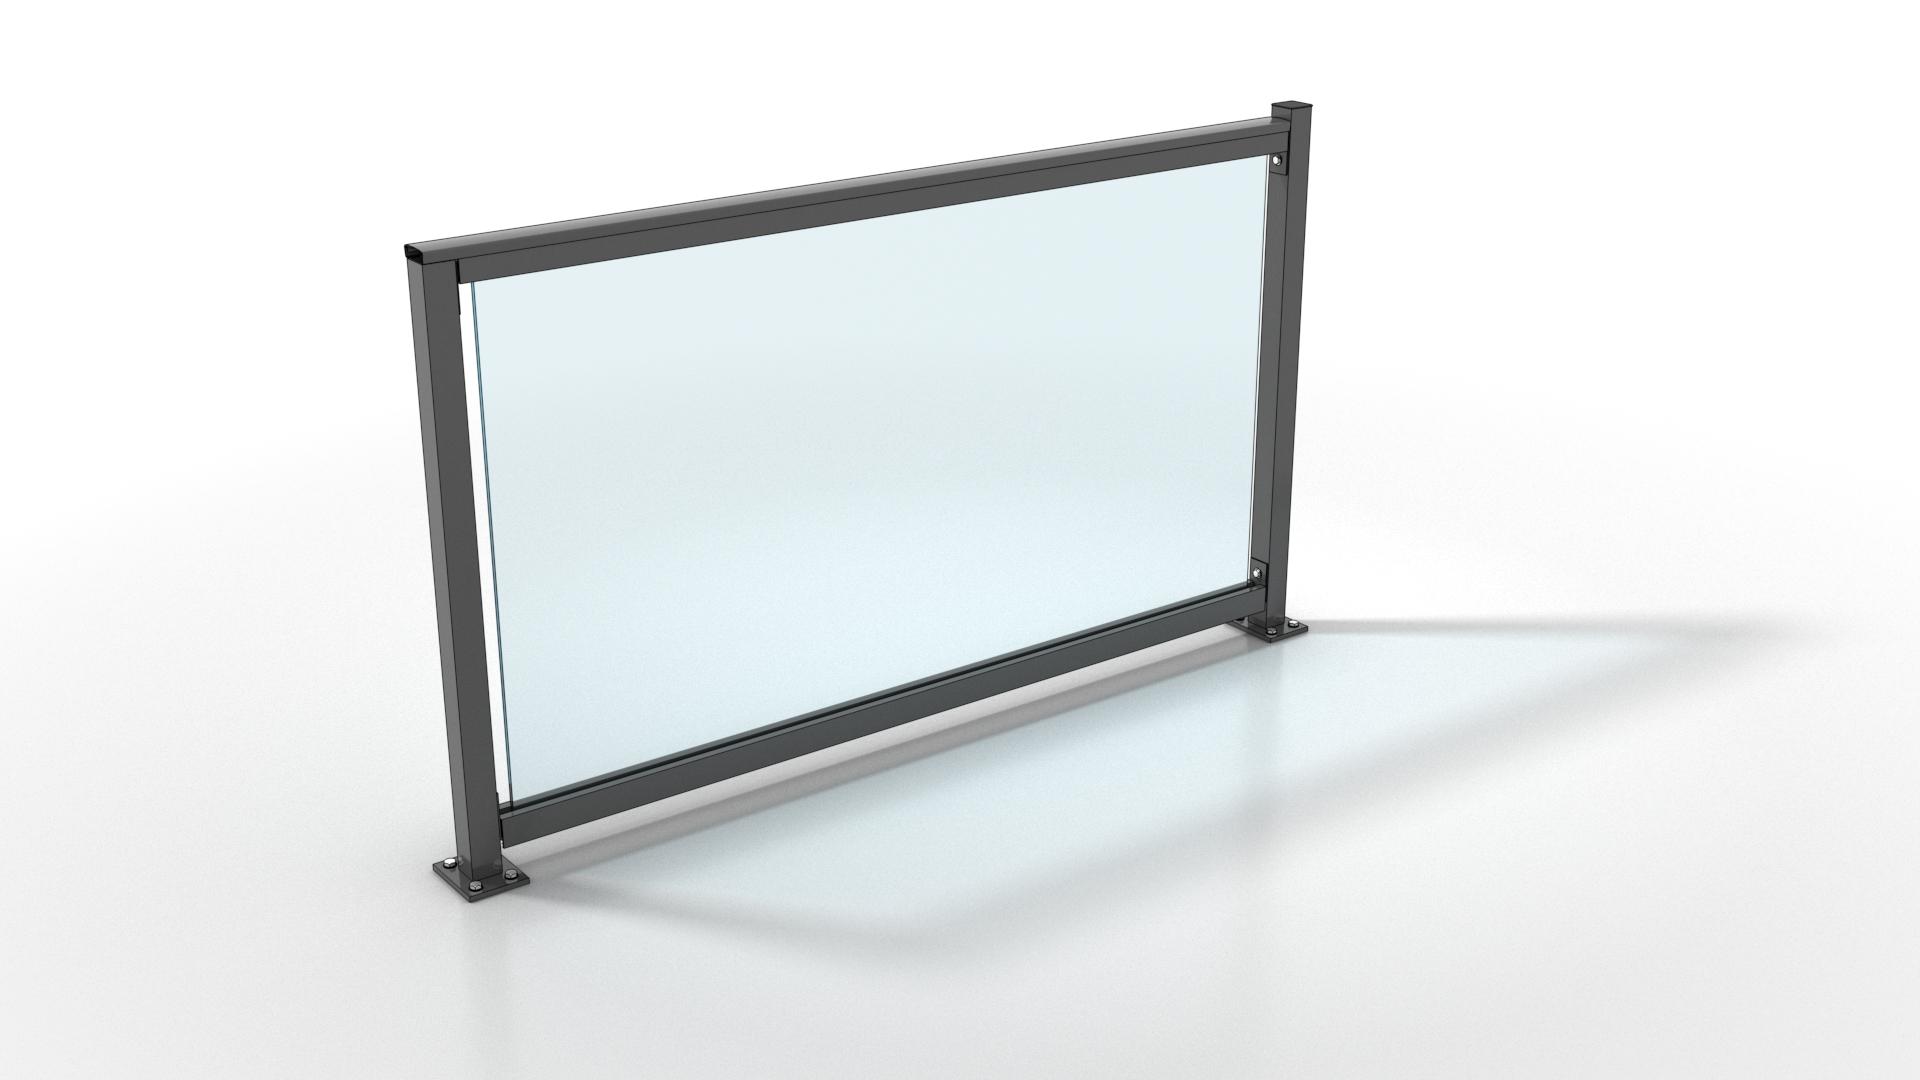 Glas tussen balusters